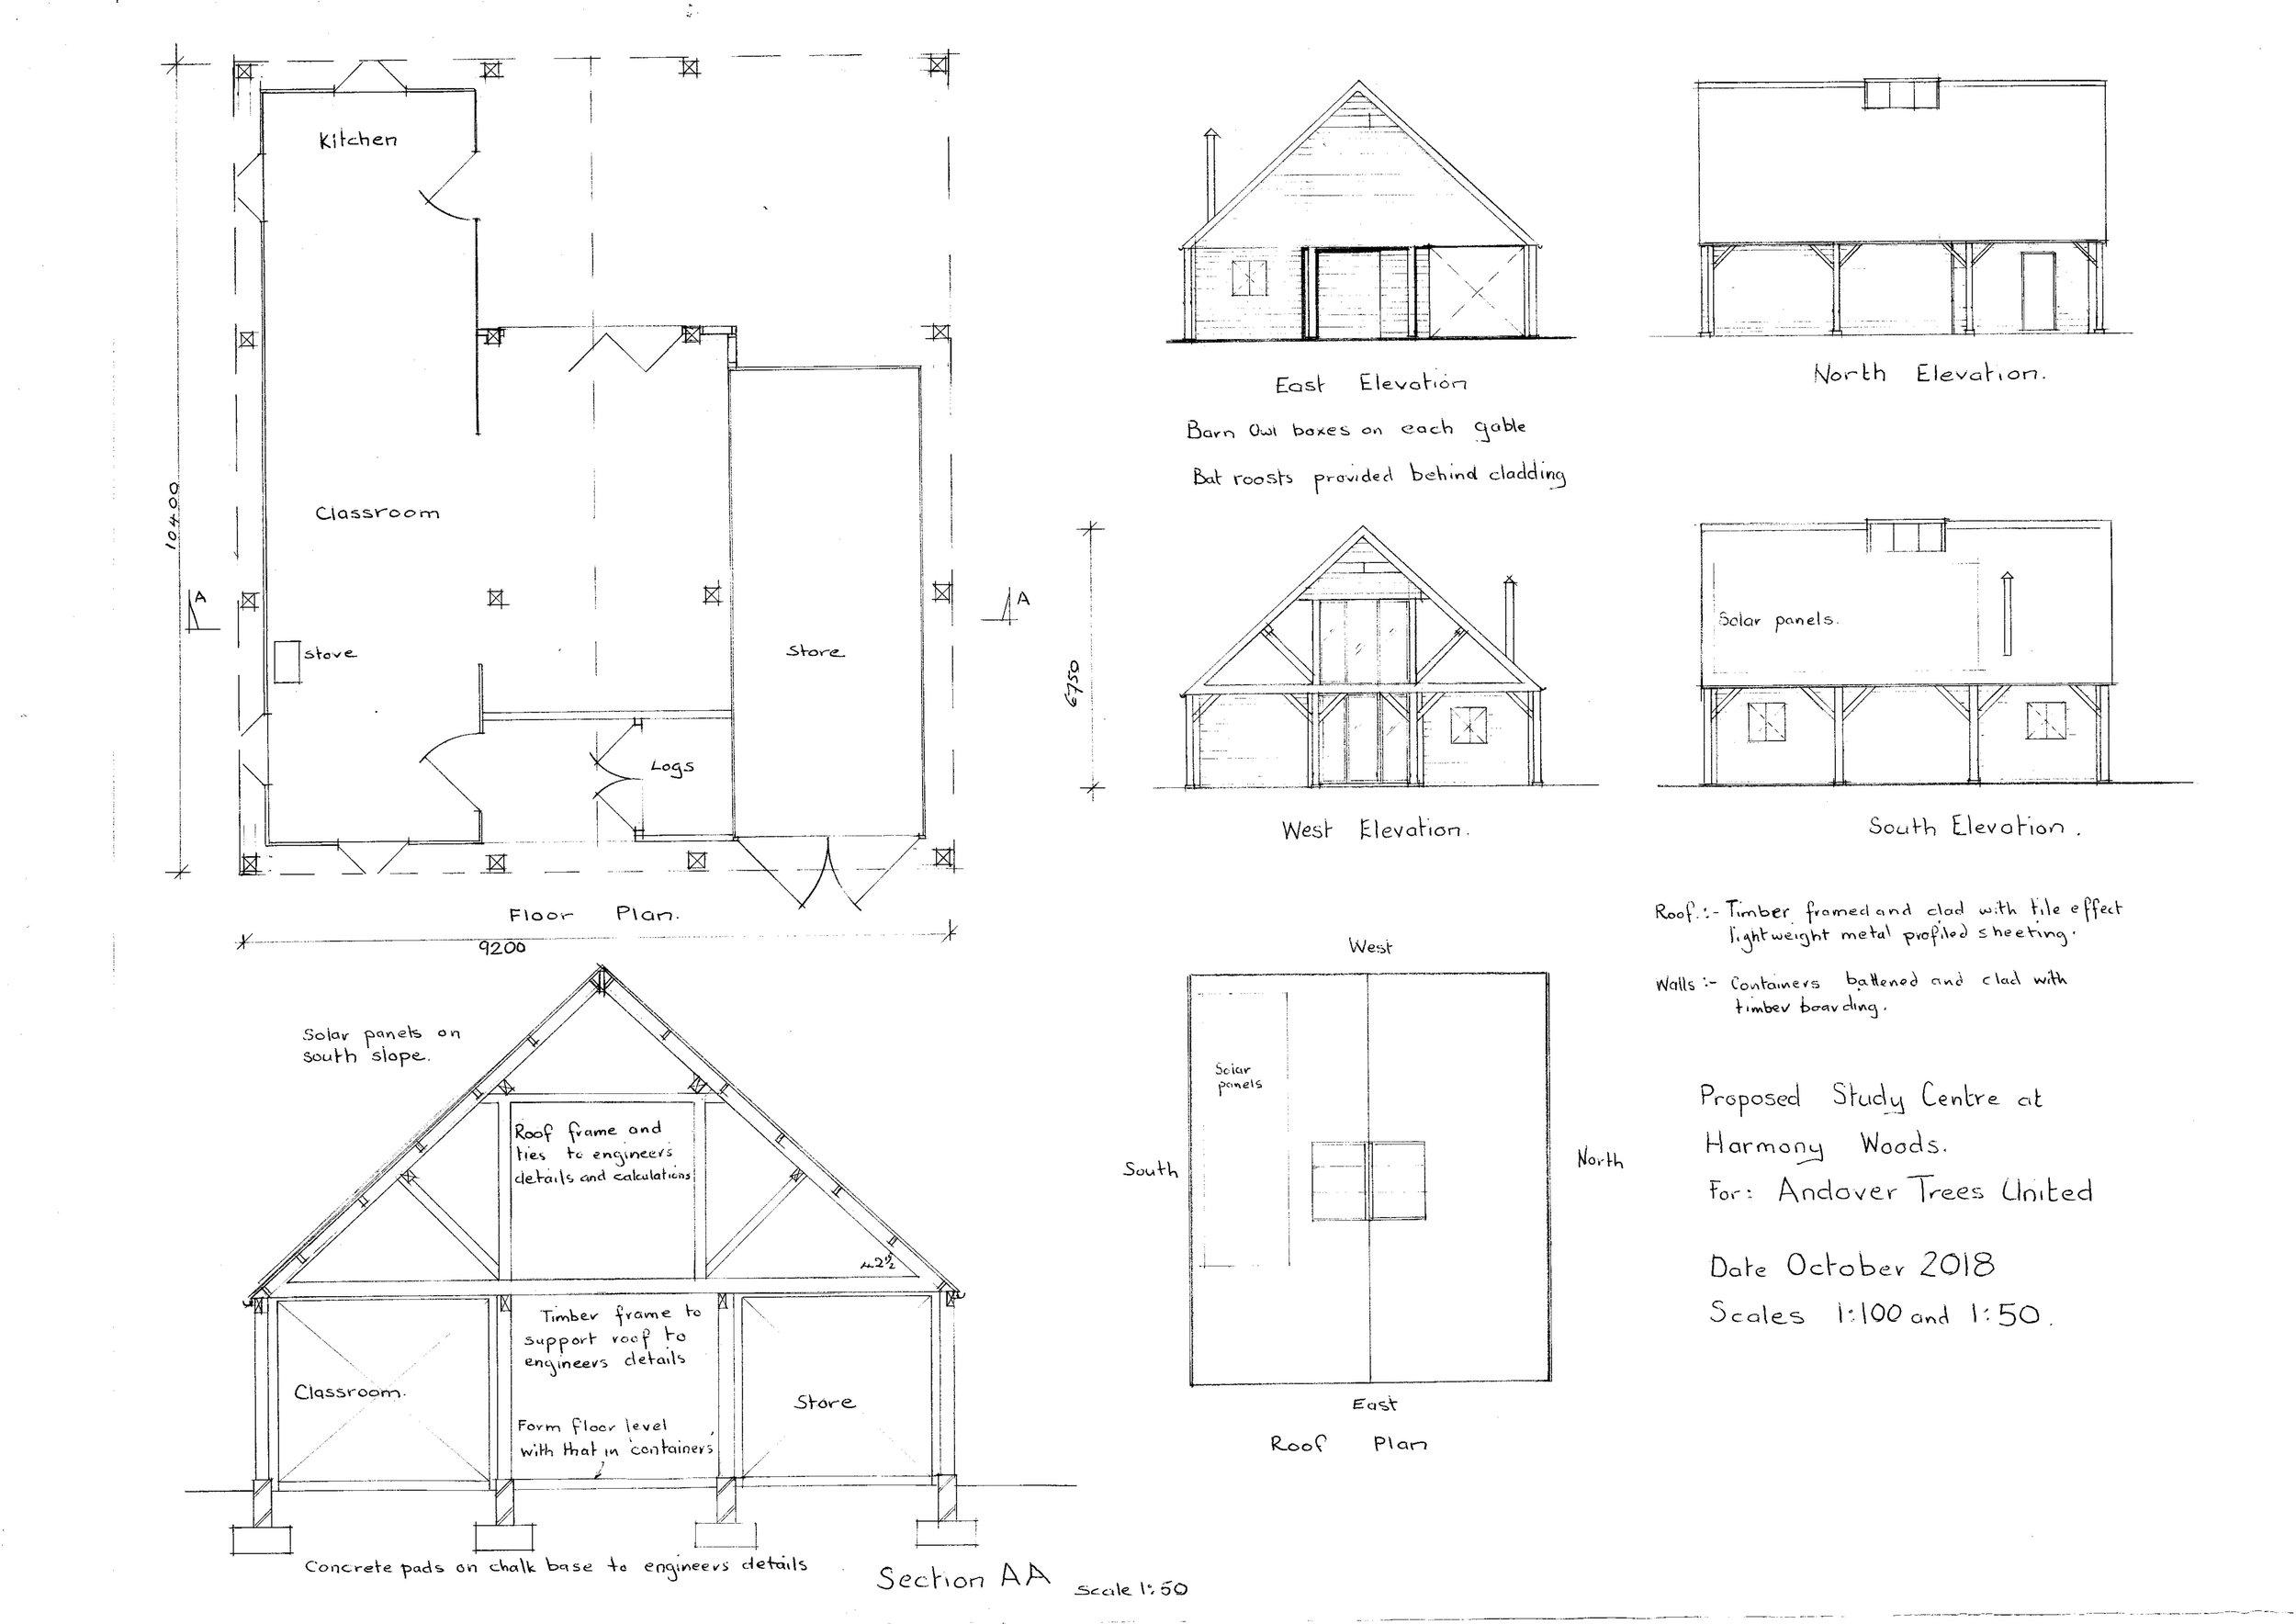 Plan_FINAL2_Structural Engineering Considered_Nov 18.jpg